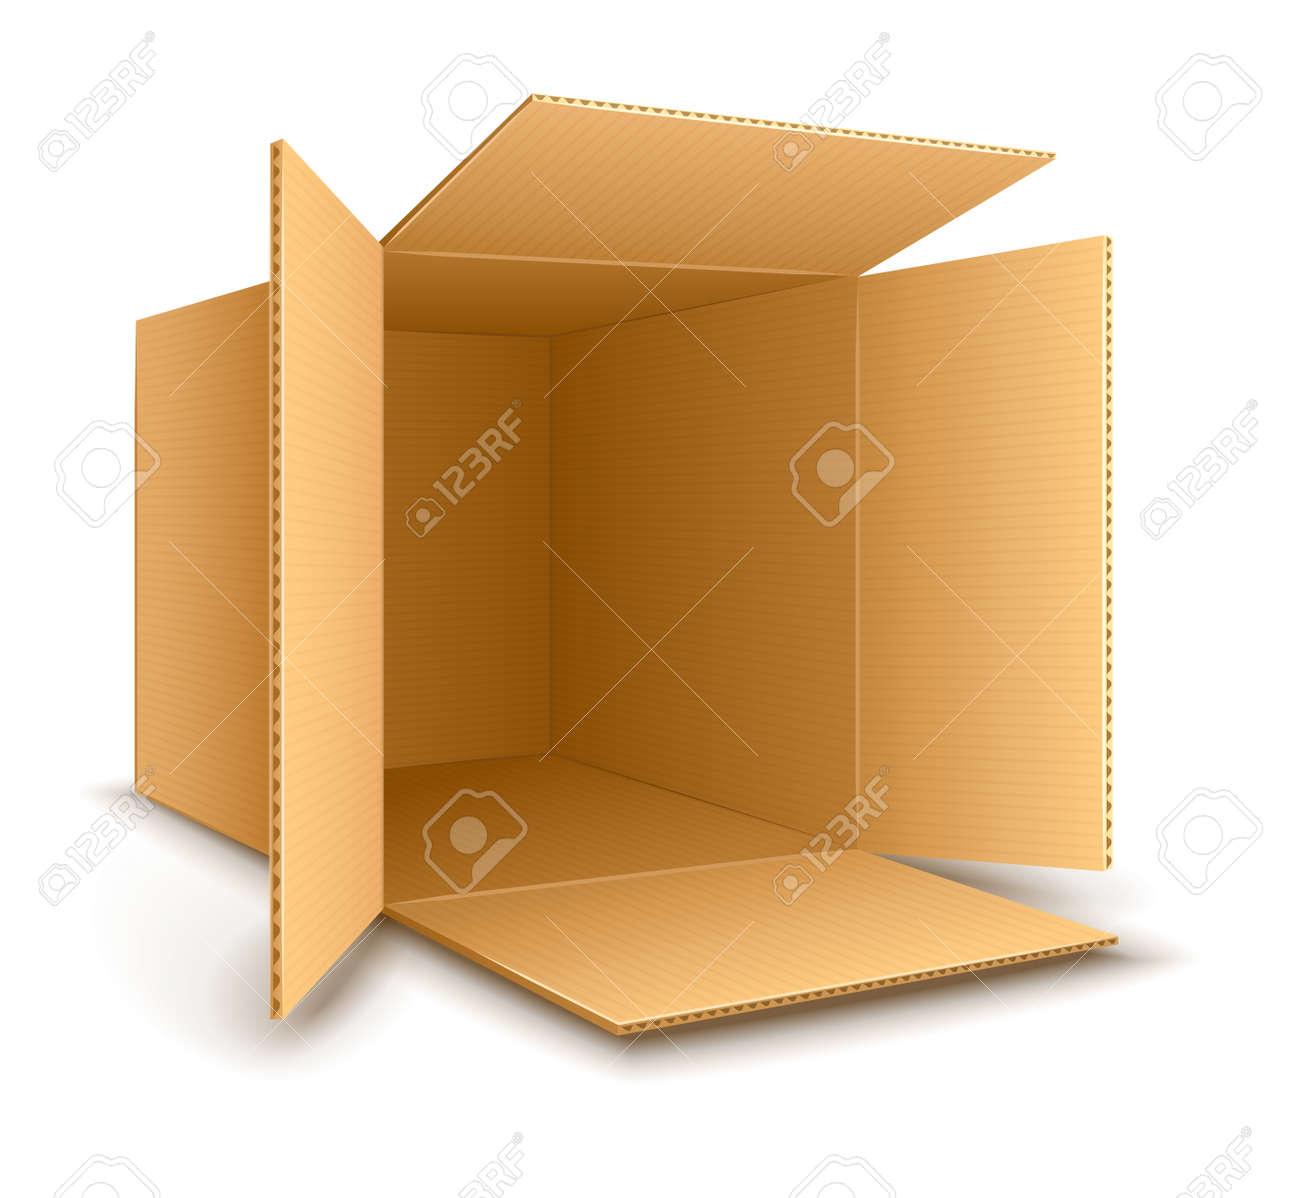 Open empty cardboard box. Stock Vector - 26519134